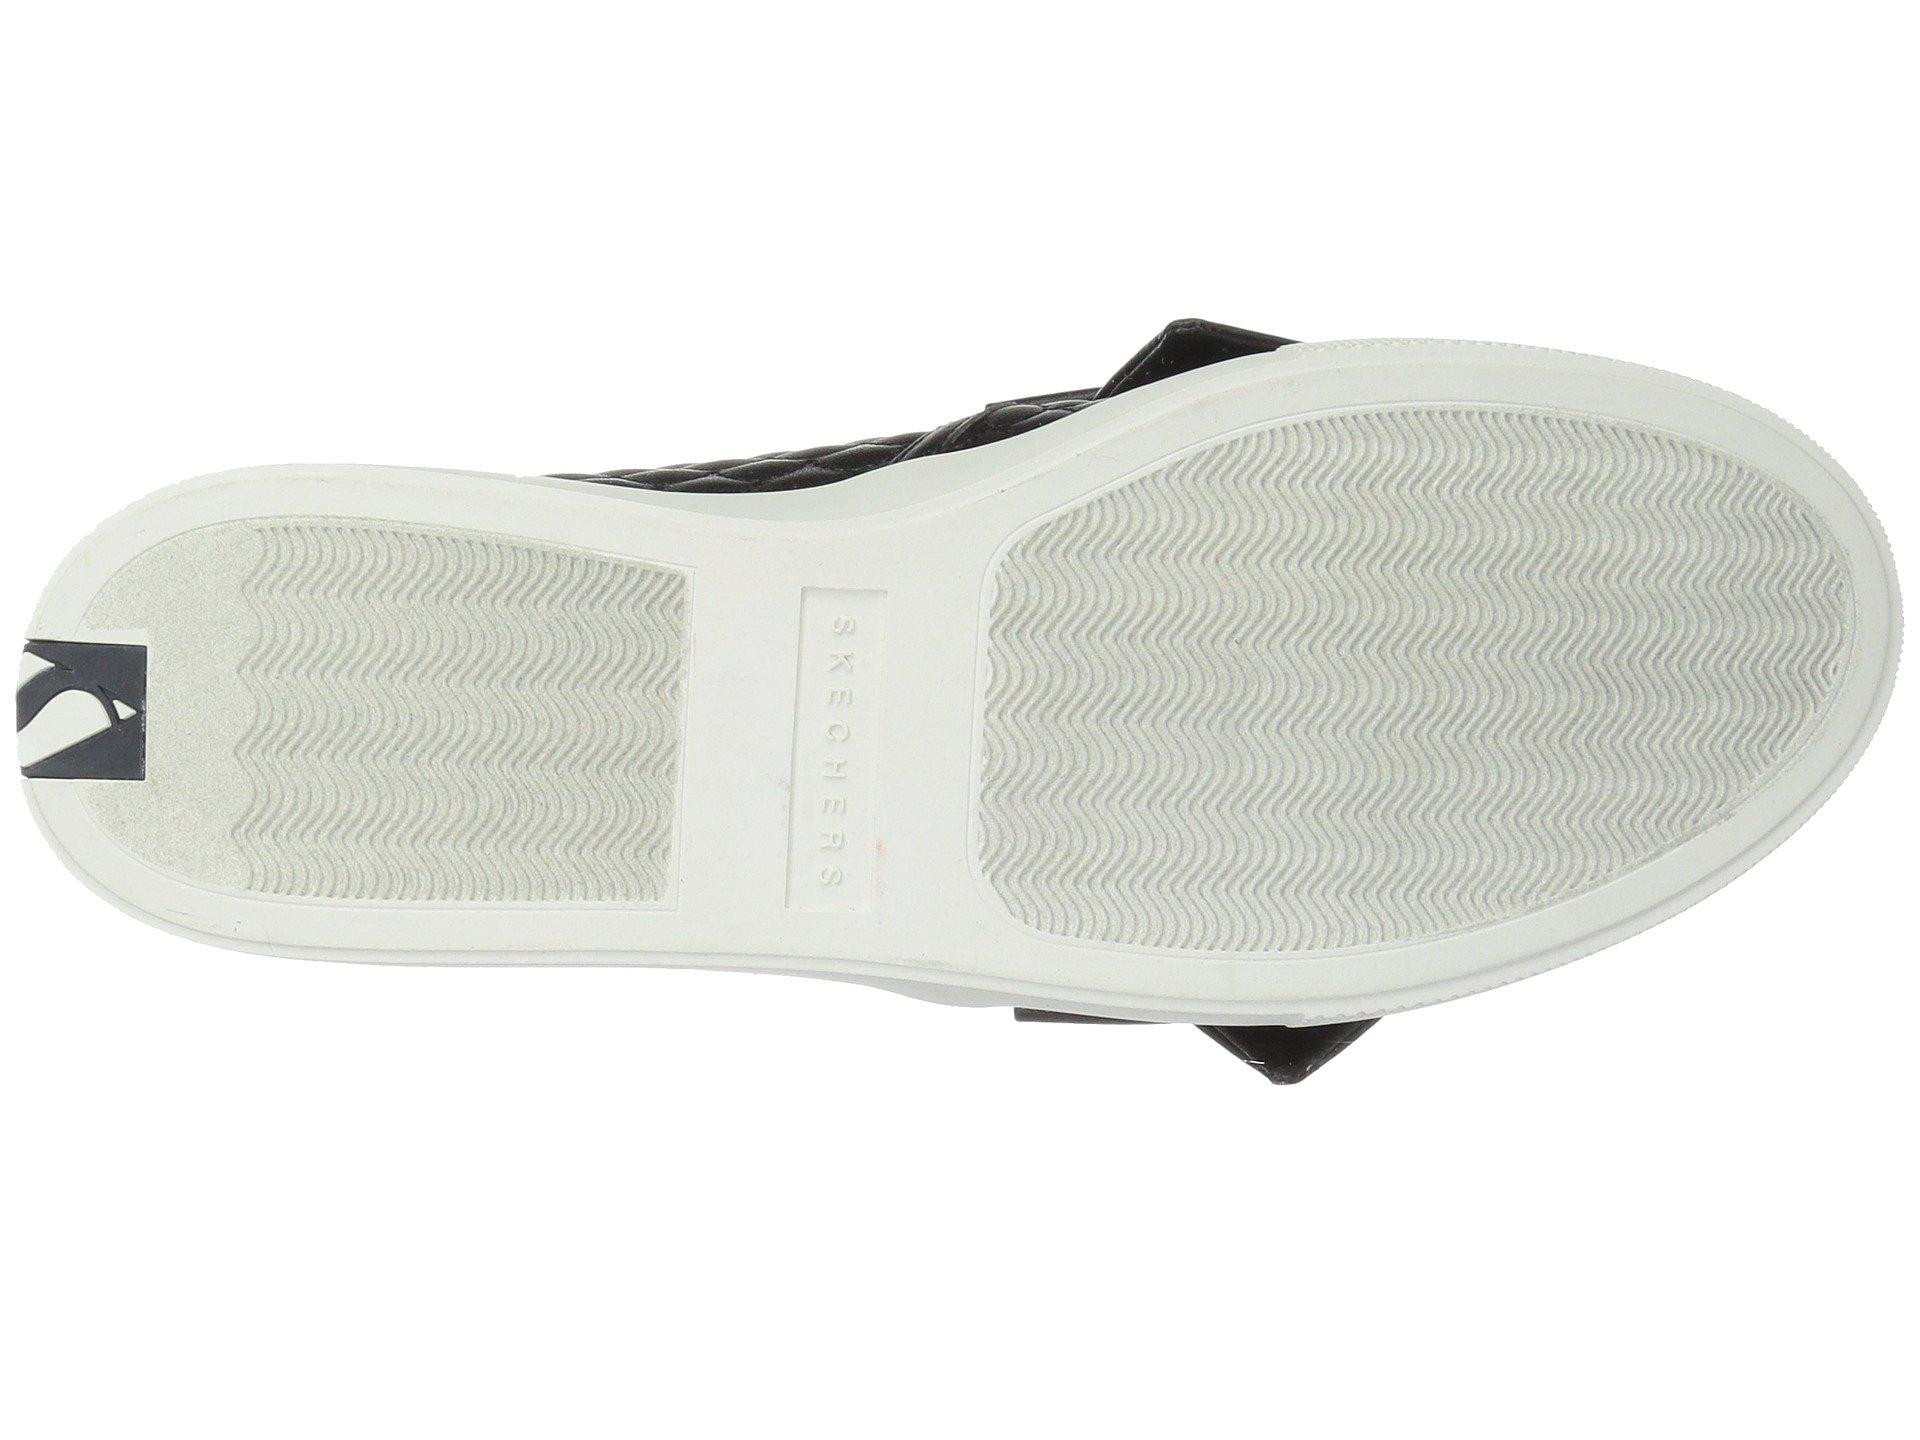 f707b43f5e49 Skechers - Moda - Lady Pink (black) Women s Slip On Shoes - Lyst. View  fullscreen